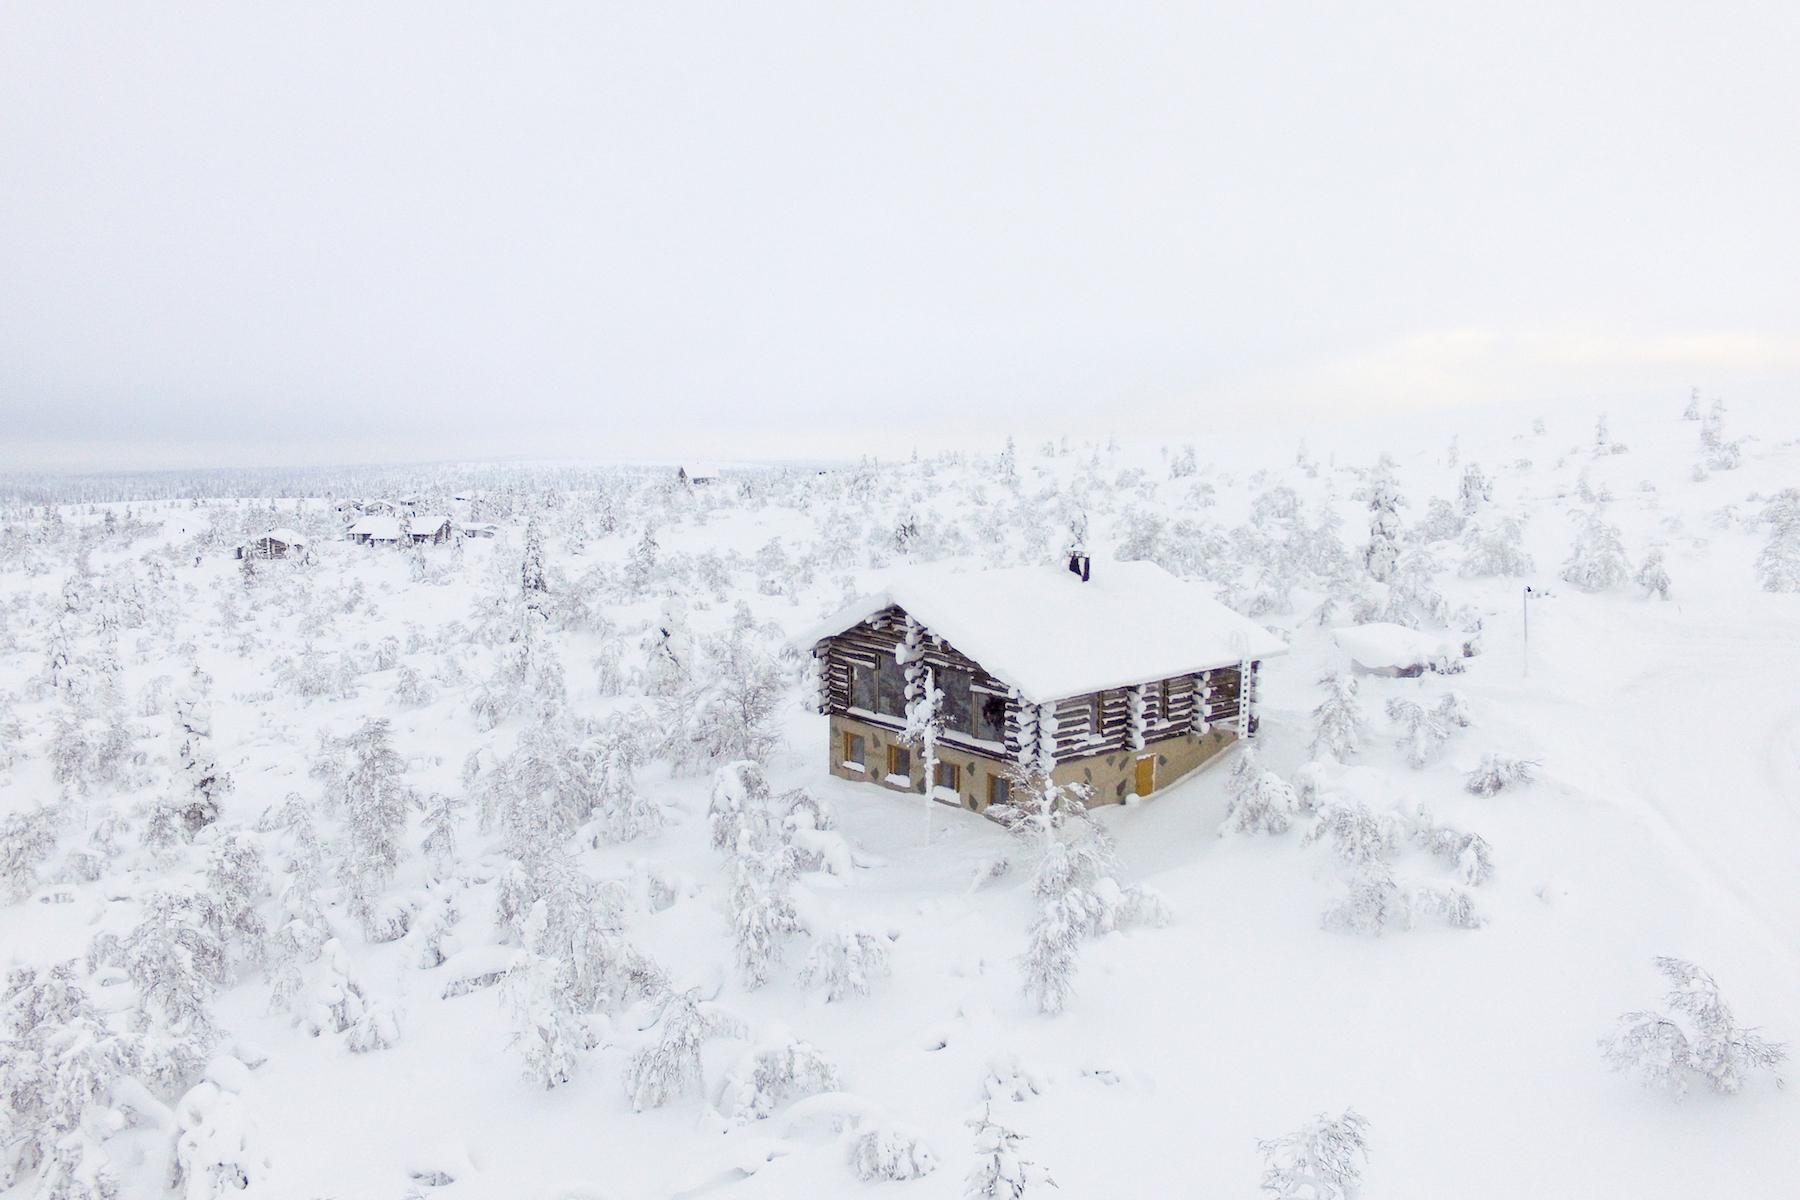 独户住宅 为 销售 在 Extraordinary Ski Chalet in Lapland Uuvana 1 Other Cities In Finland, Cities In Finland, 99830 Finland